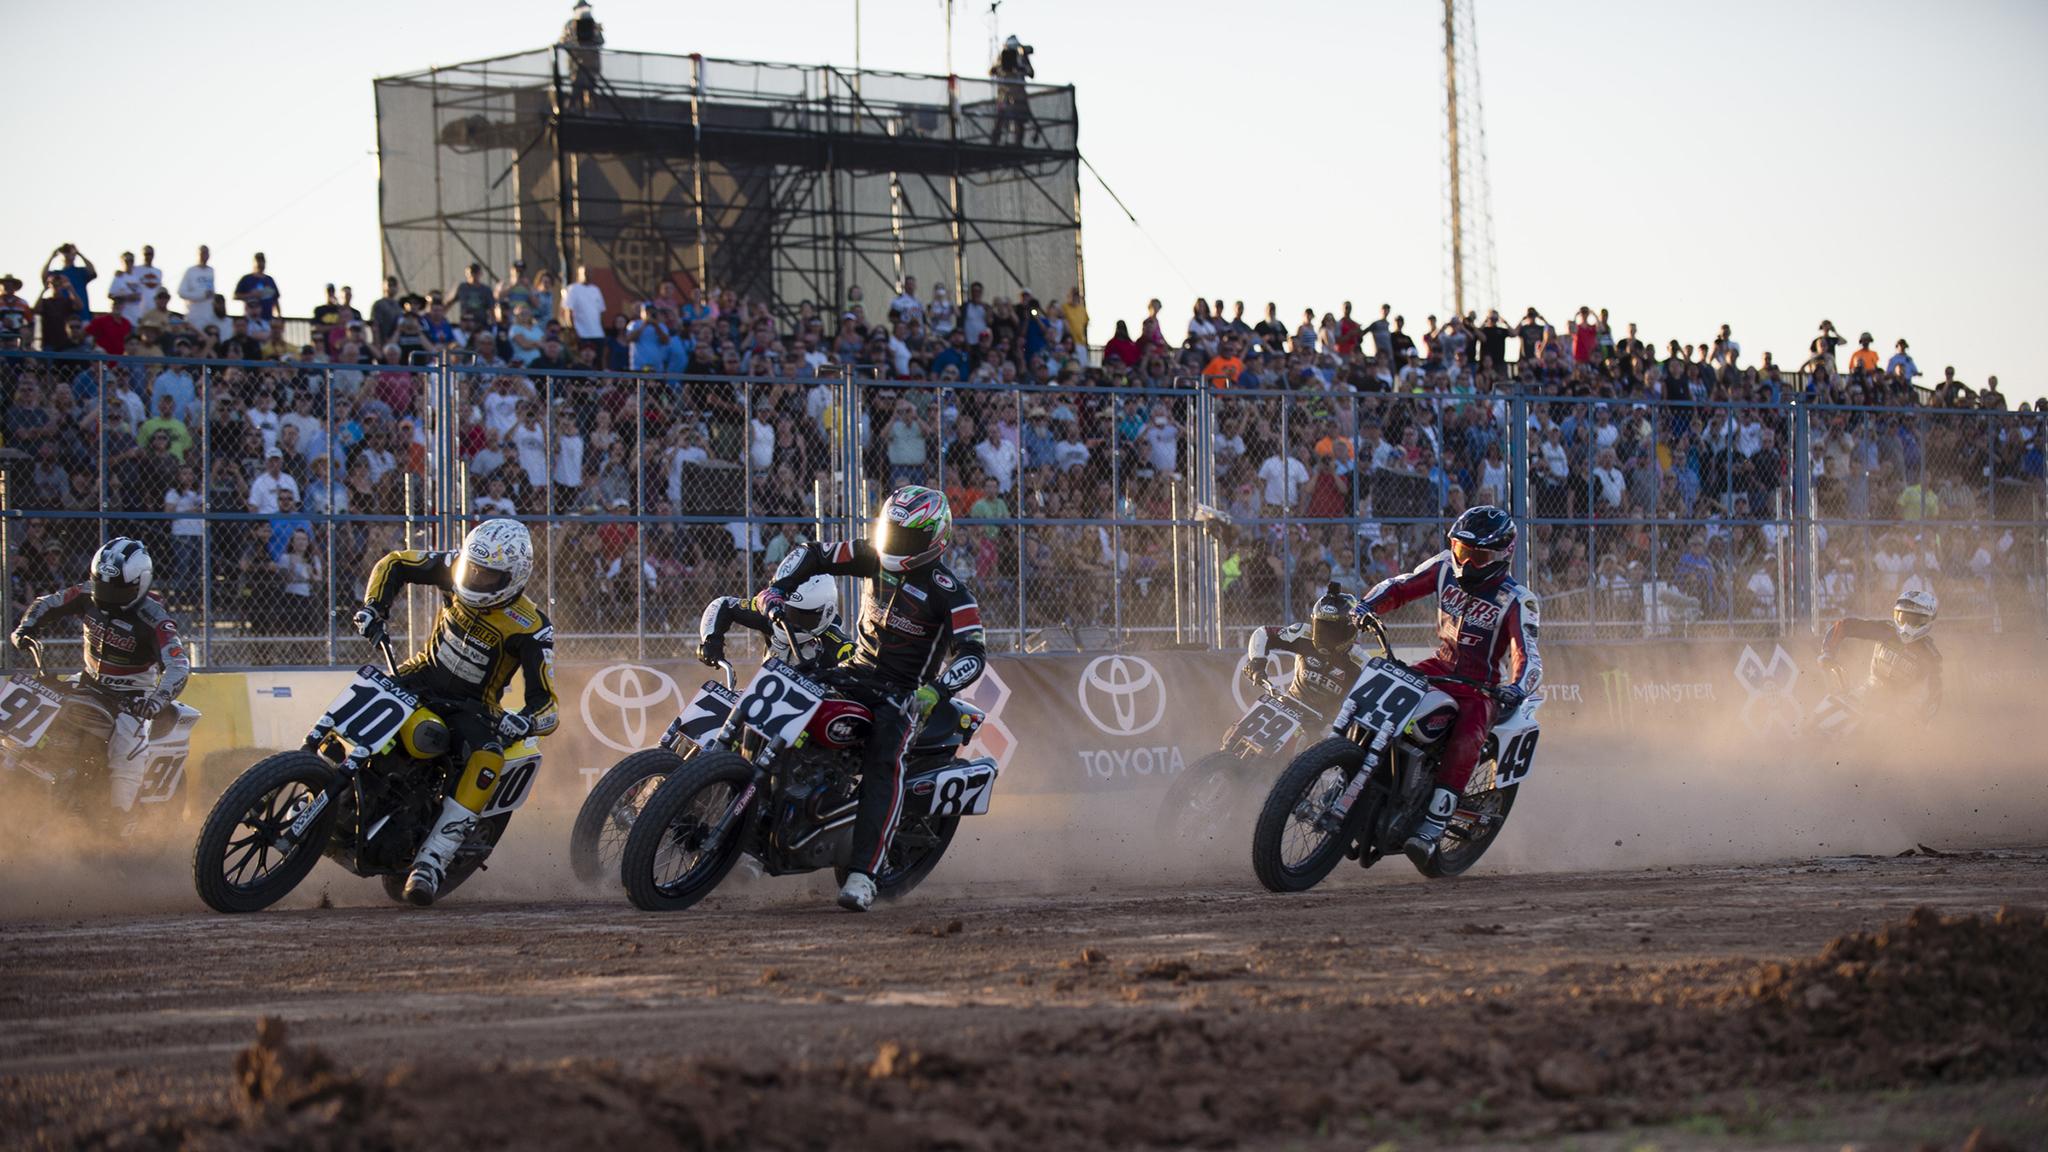 9: Flat-track racing debuts in Austin